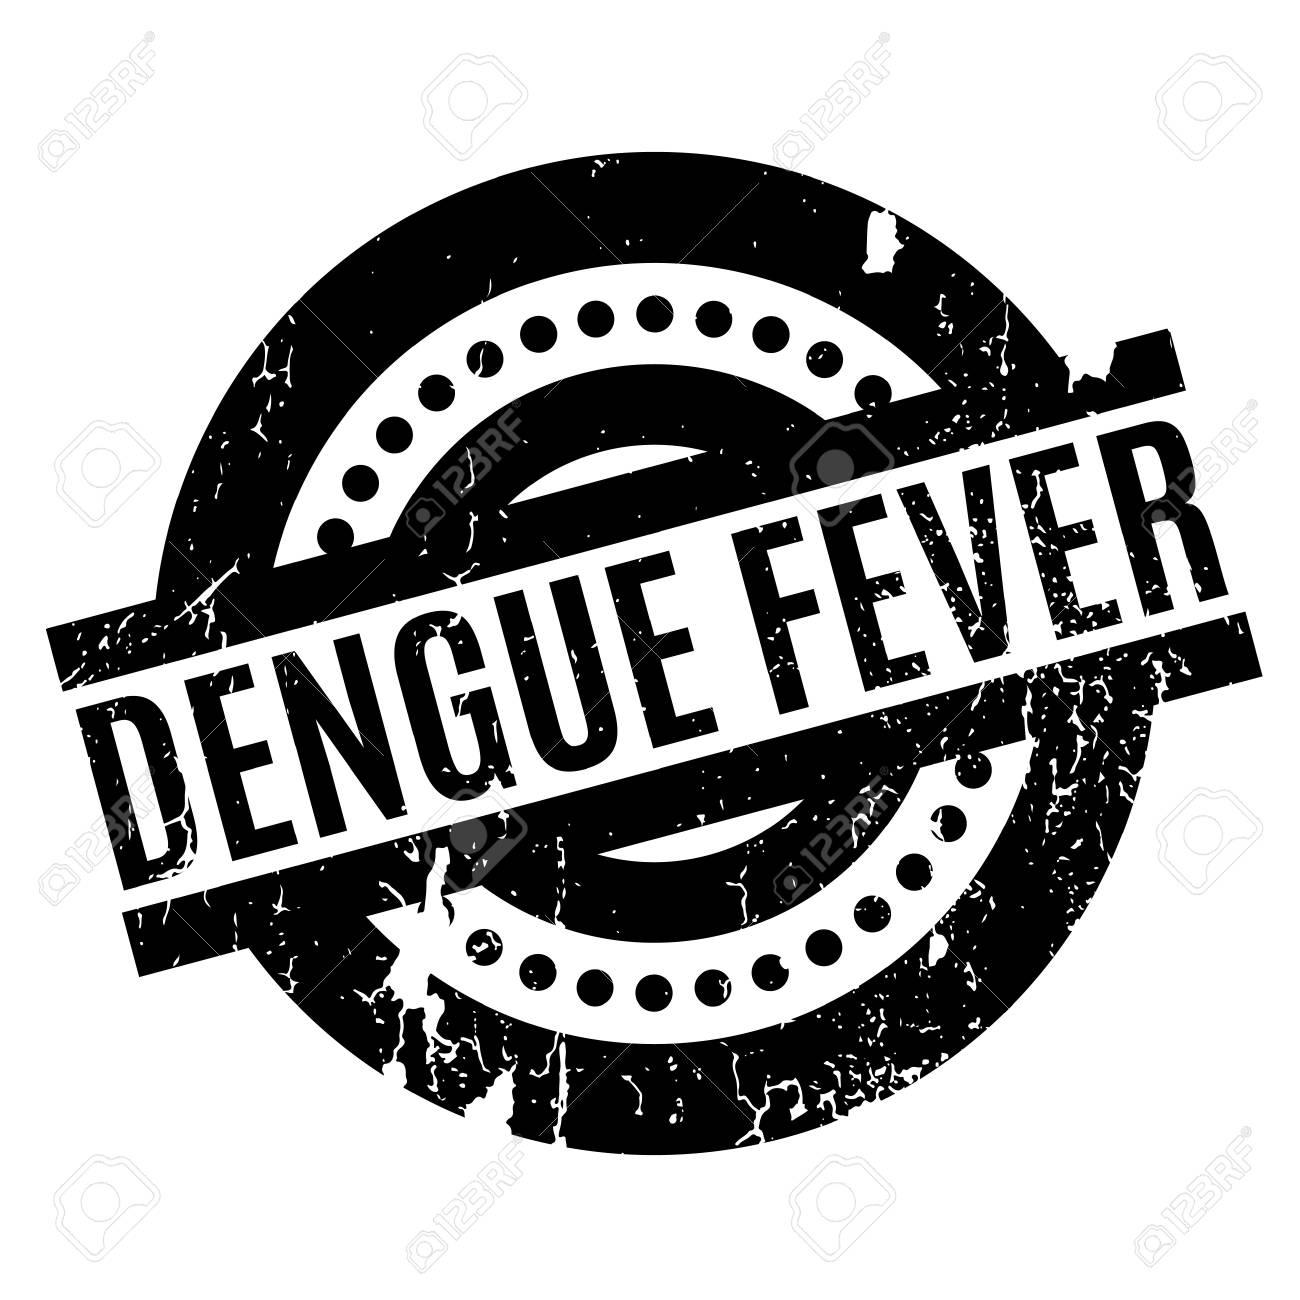 Dengue Fever Infects La Fte De >> Dengue Fever Rubber Stamp Royalty Free Cliparts Vectors And Stock